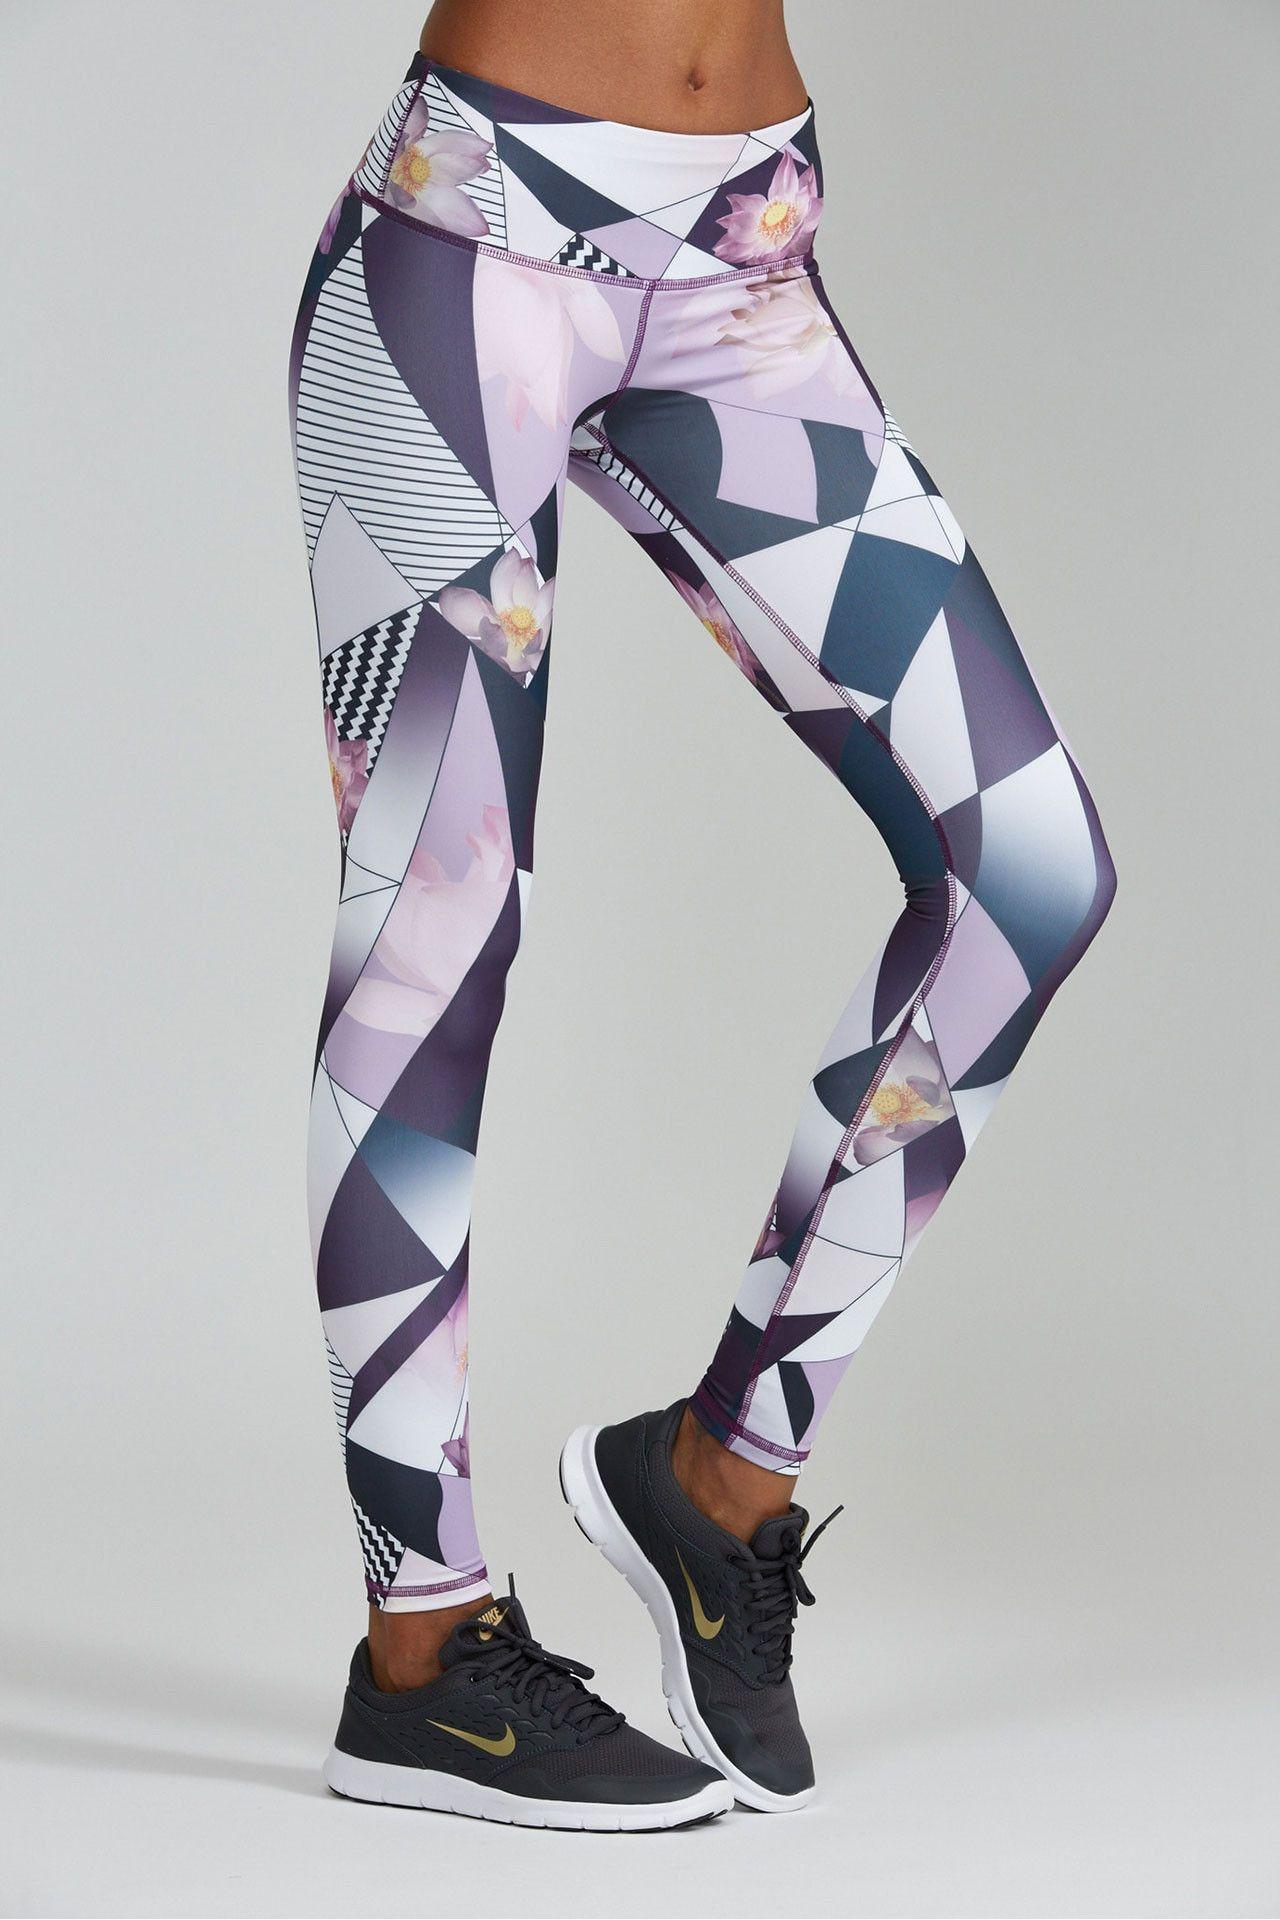 6d802daf53085 LOTUS LEGGING , Noli Yoga - Sculptique | Workout clothing/gear ...